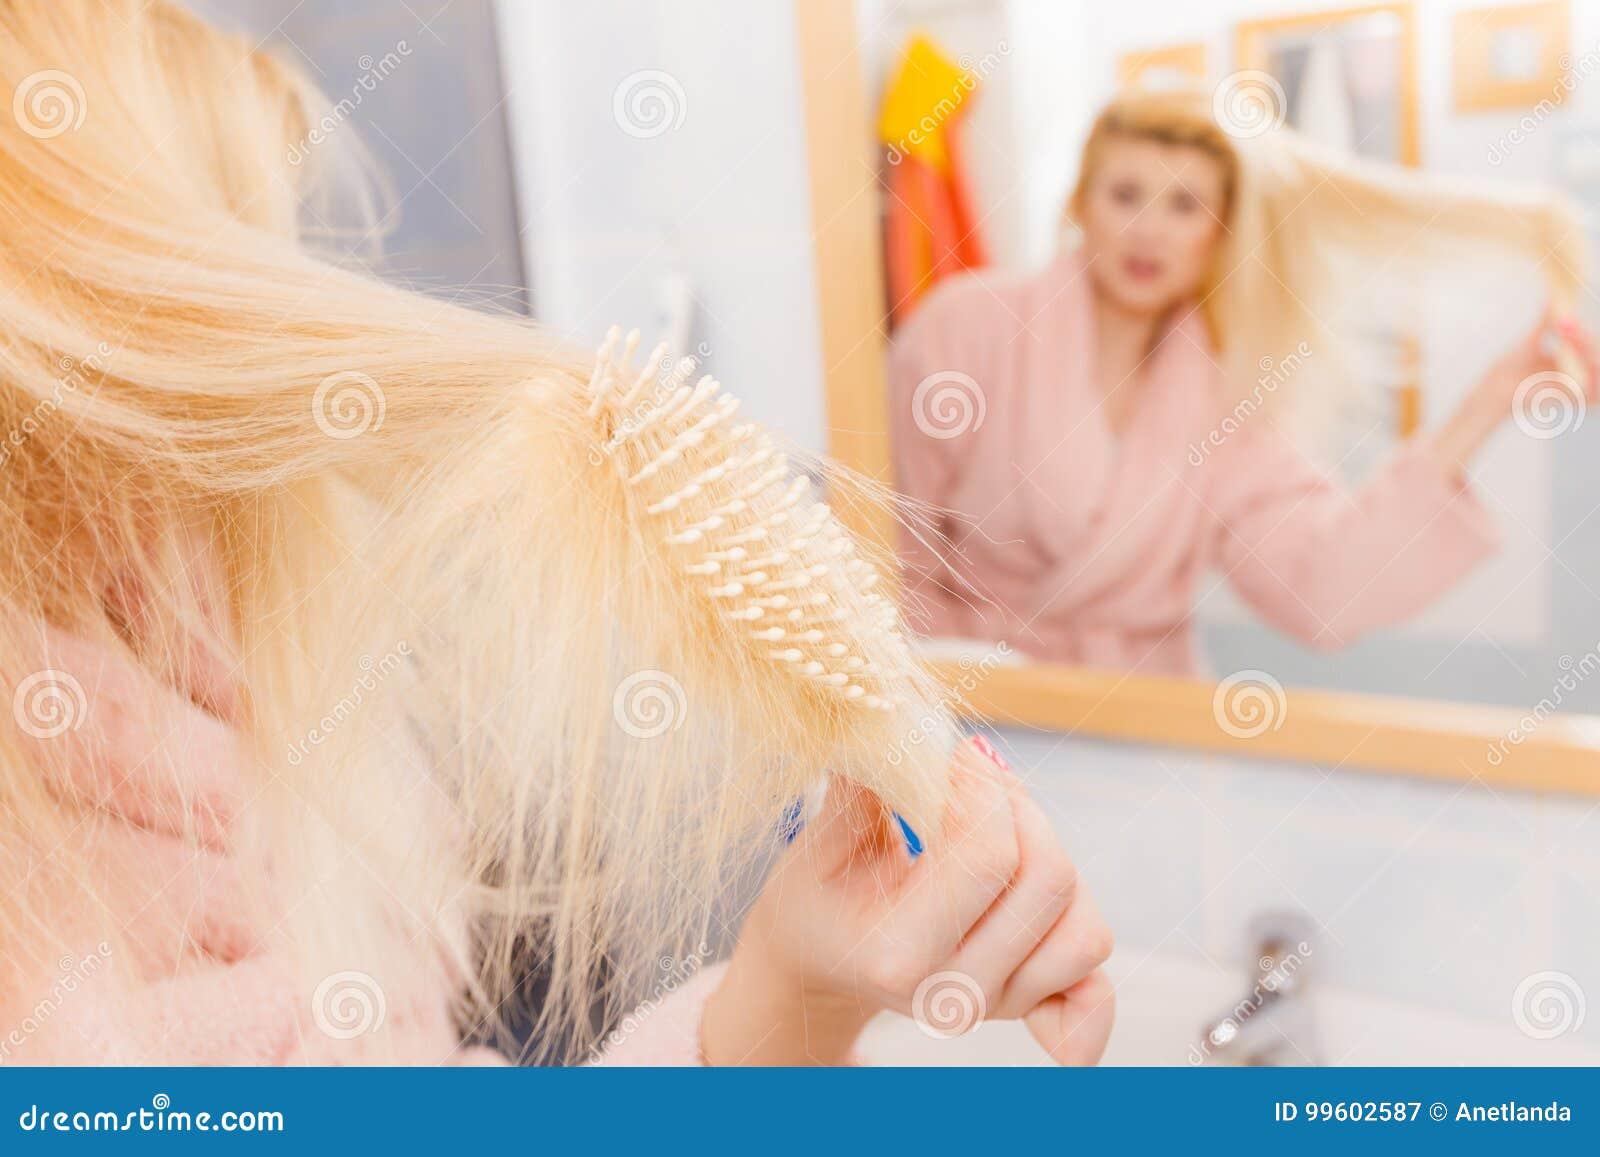 Shocked Woman Wearing Dressing Gown Brushing Her Hair Stock Image ...